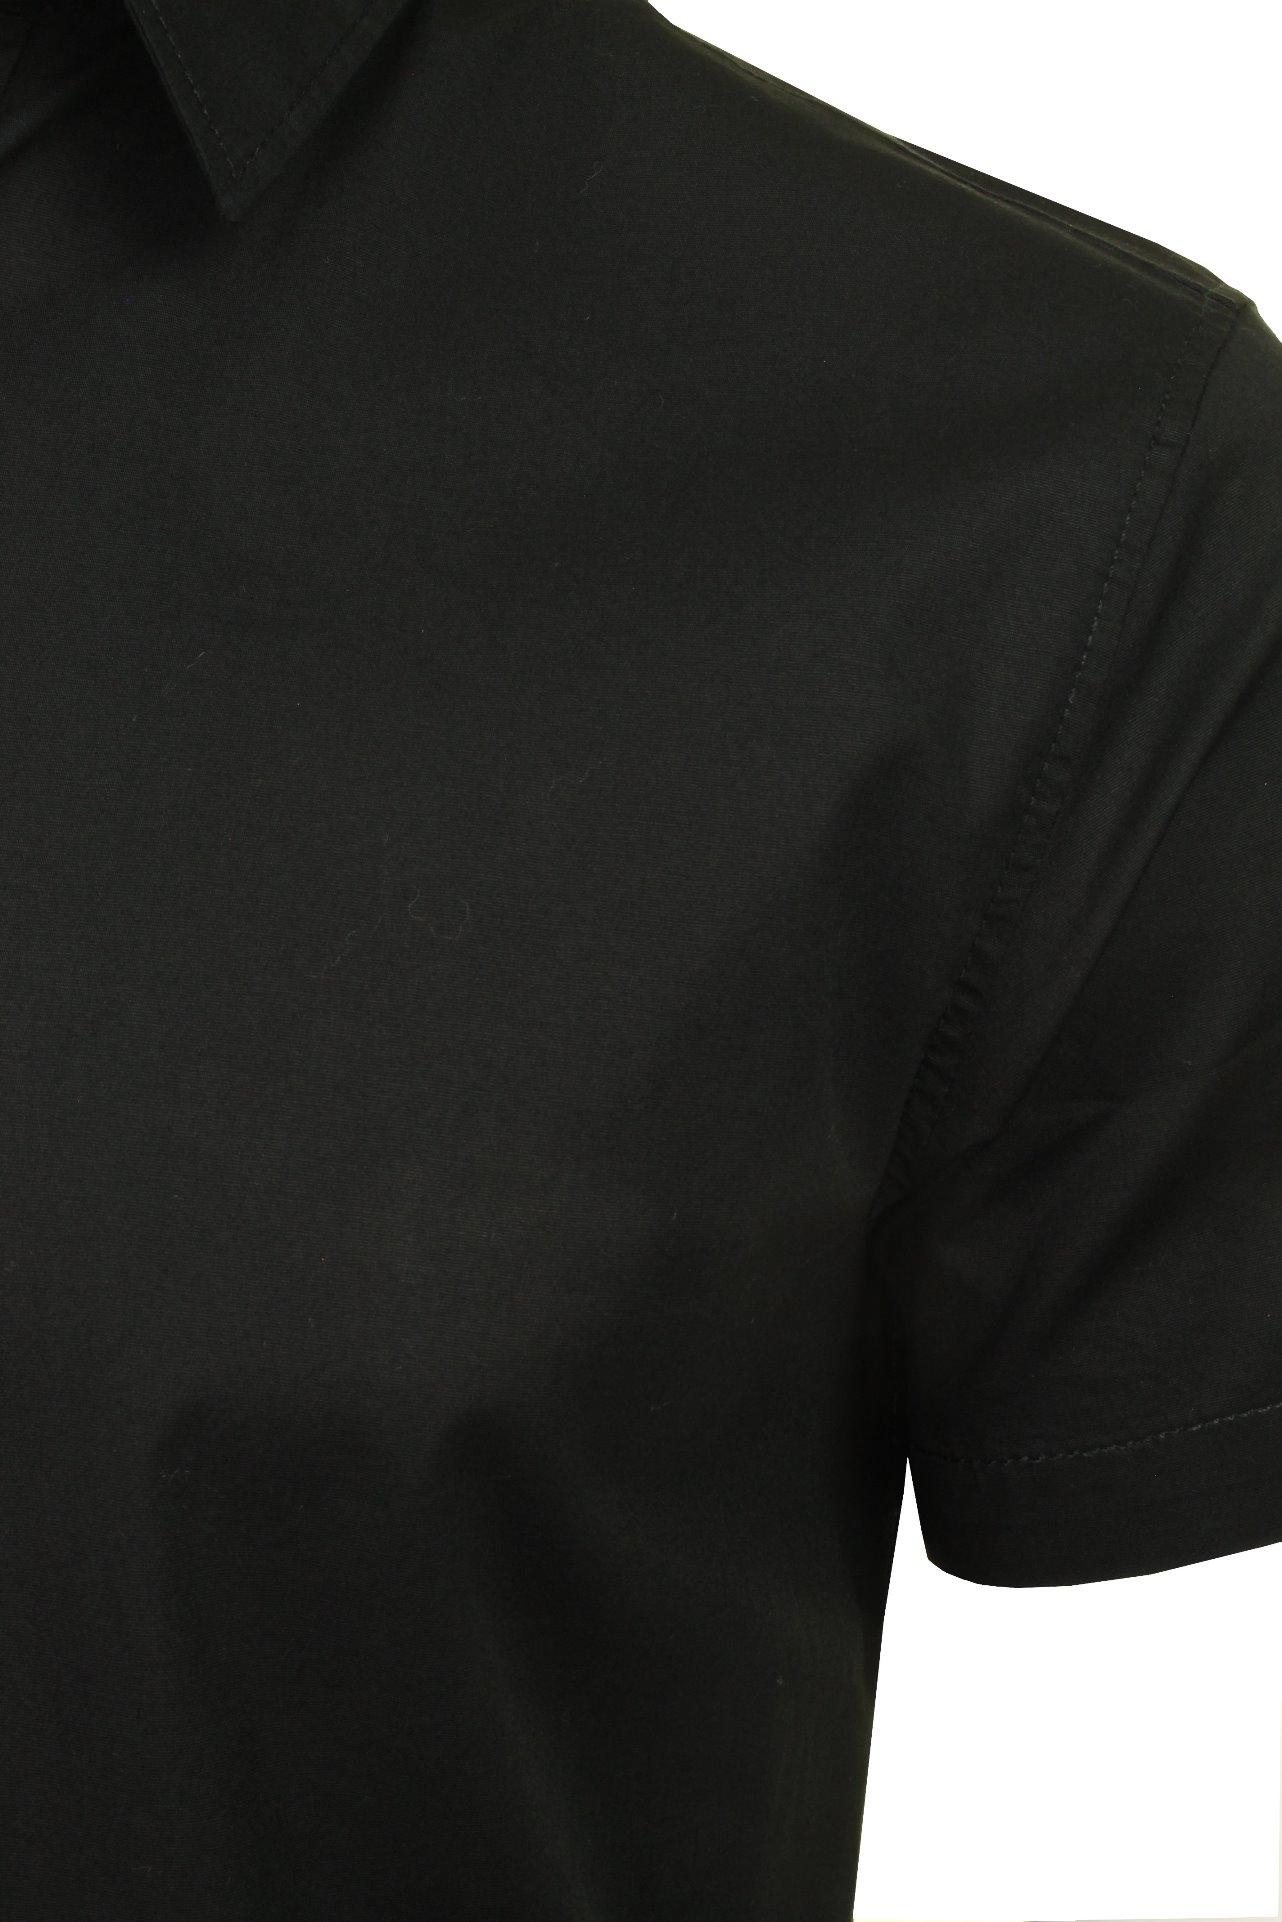 Jack-amp-Jones-Mens-039-Clint-039-Poplin-Shirt-Short-Sleeved thumbnail 4